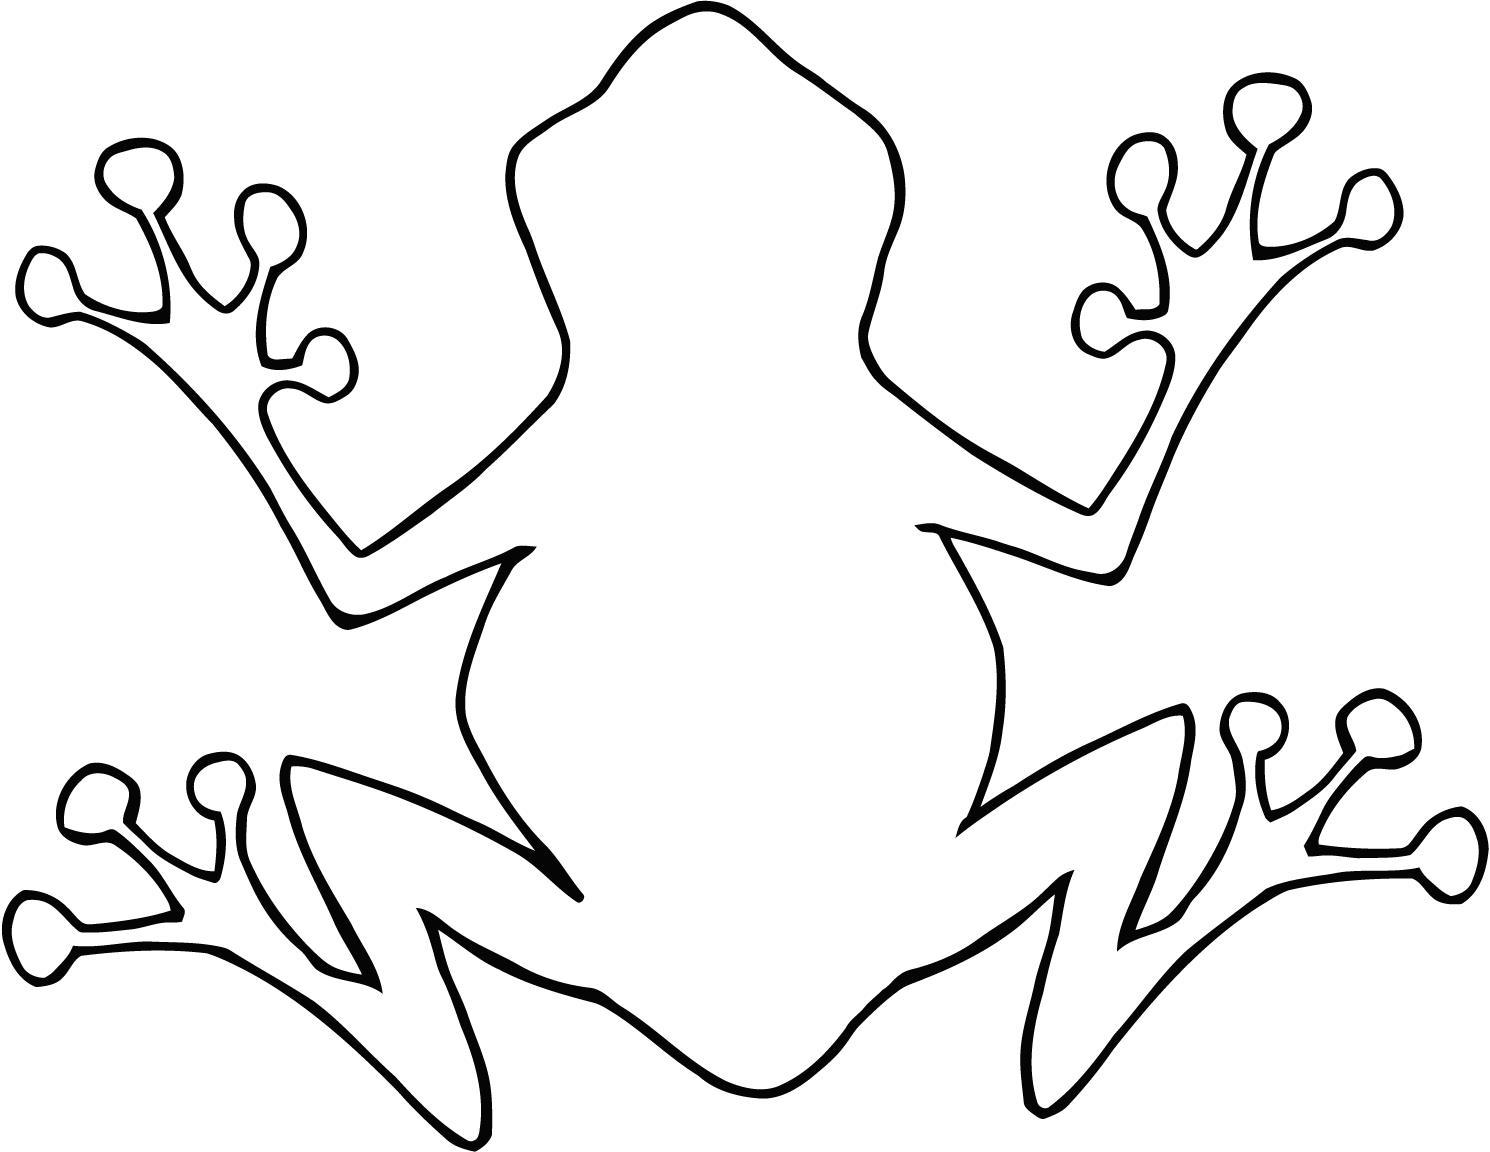 Tree Frog Outline Clipart Panda